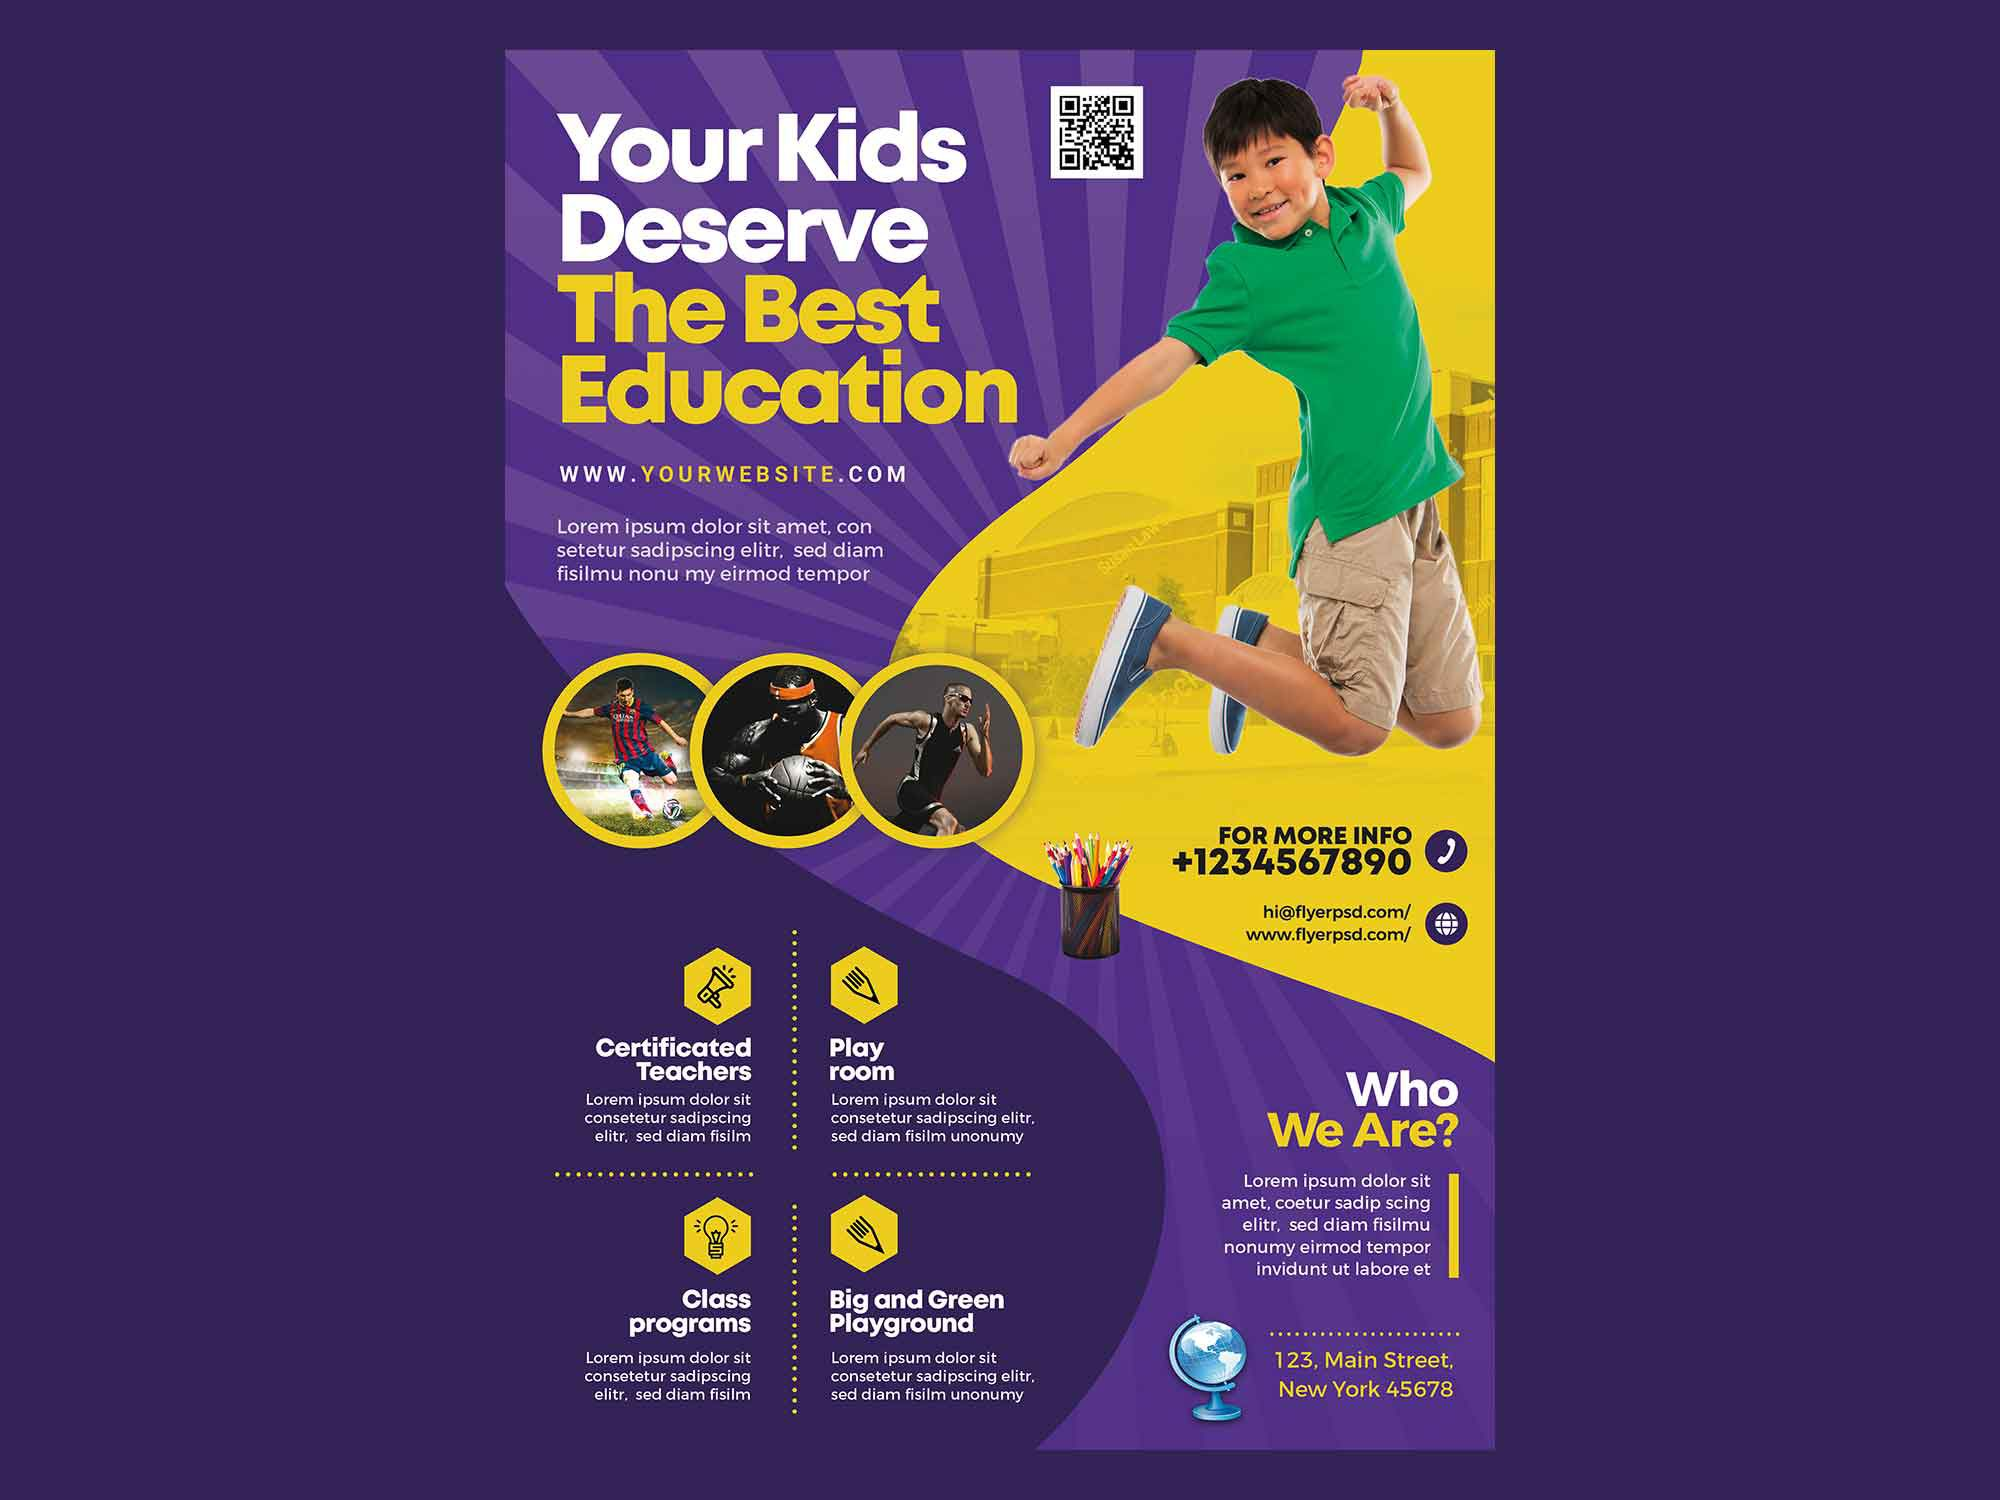 005 Rare Free School Flyer Design Template Concept  Templates Creative Education PosterFull